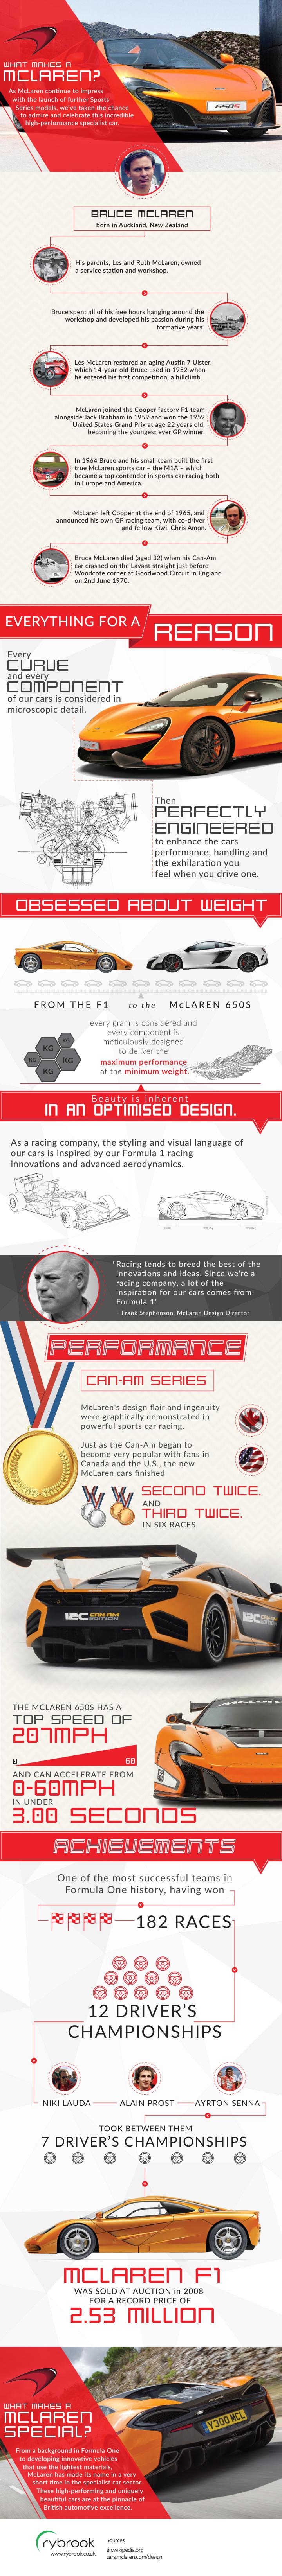 What Makes A McLaren?